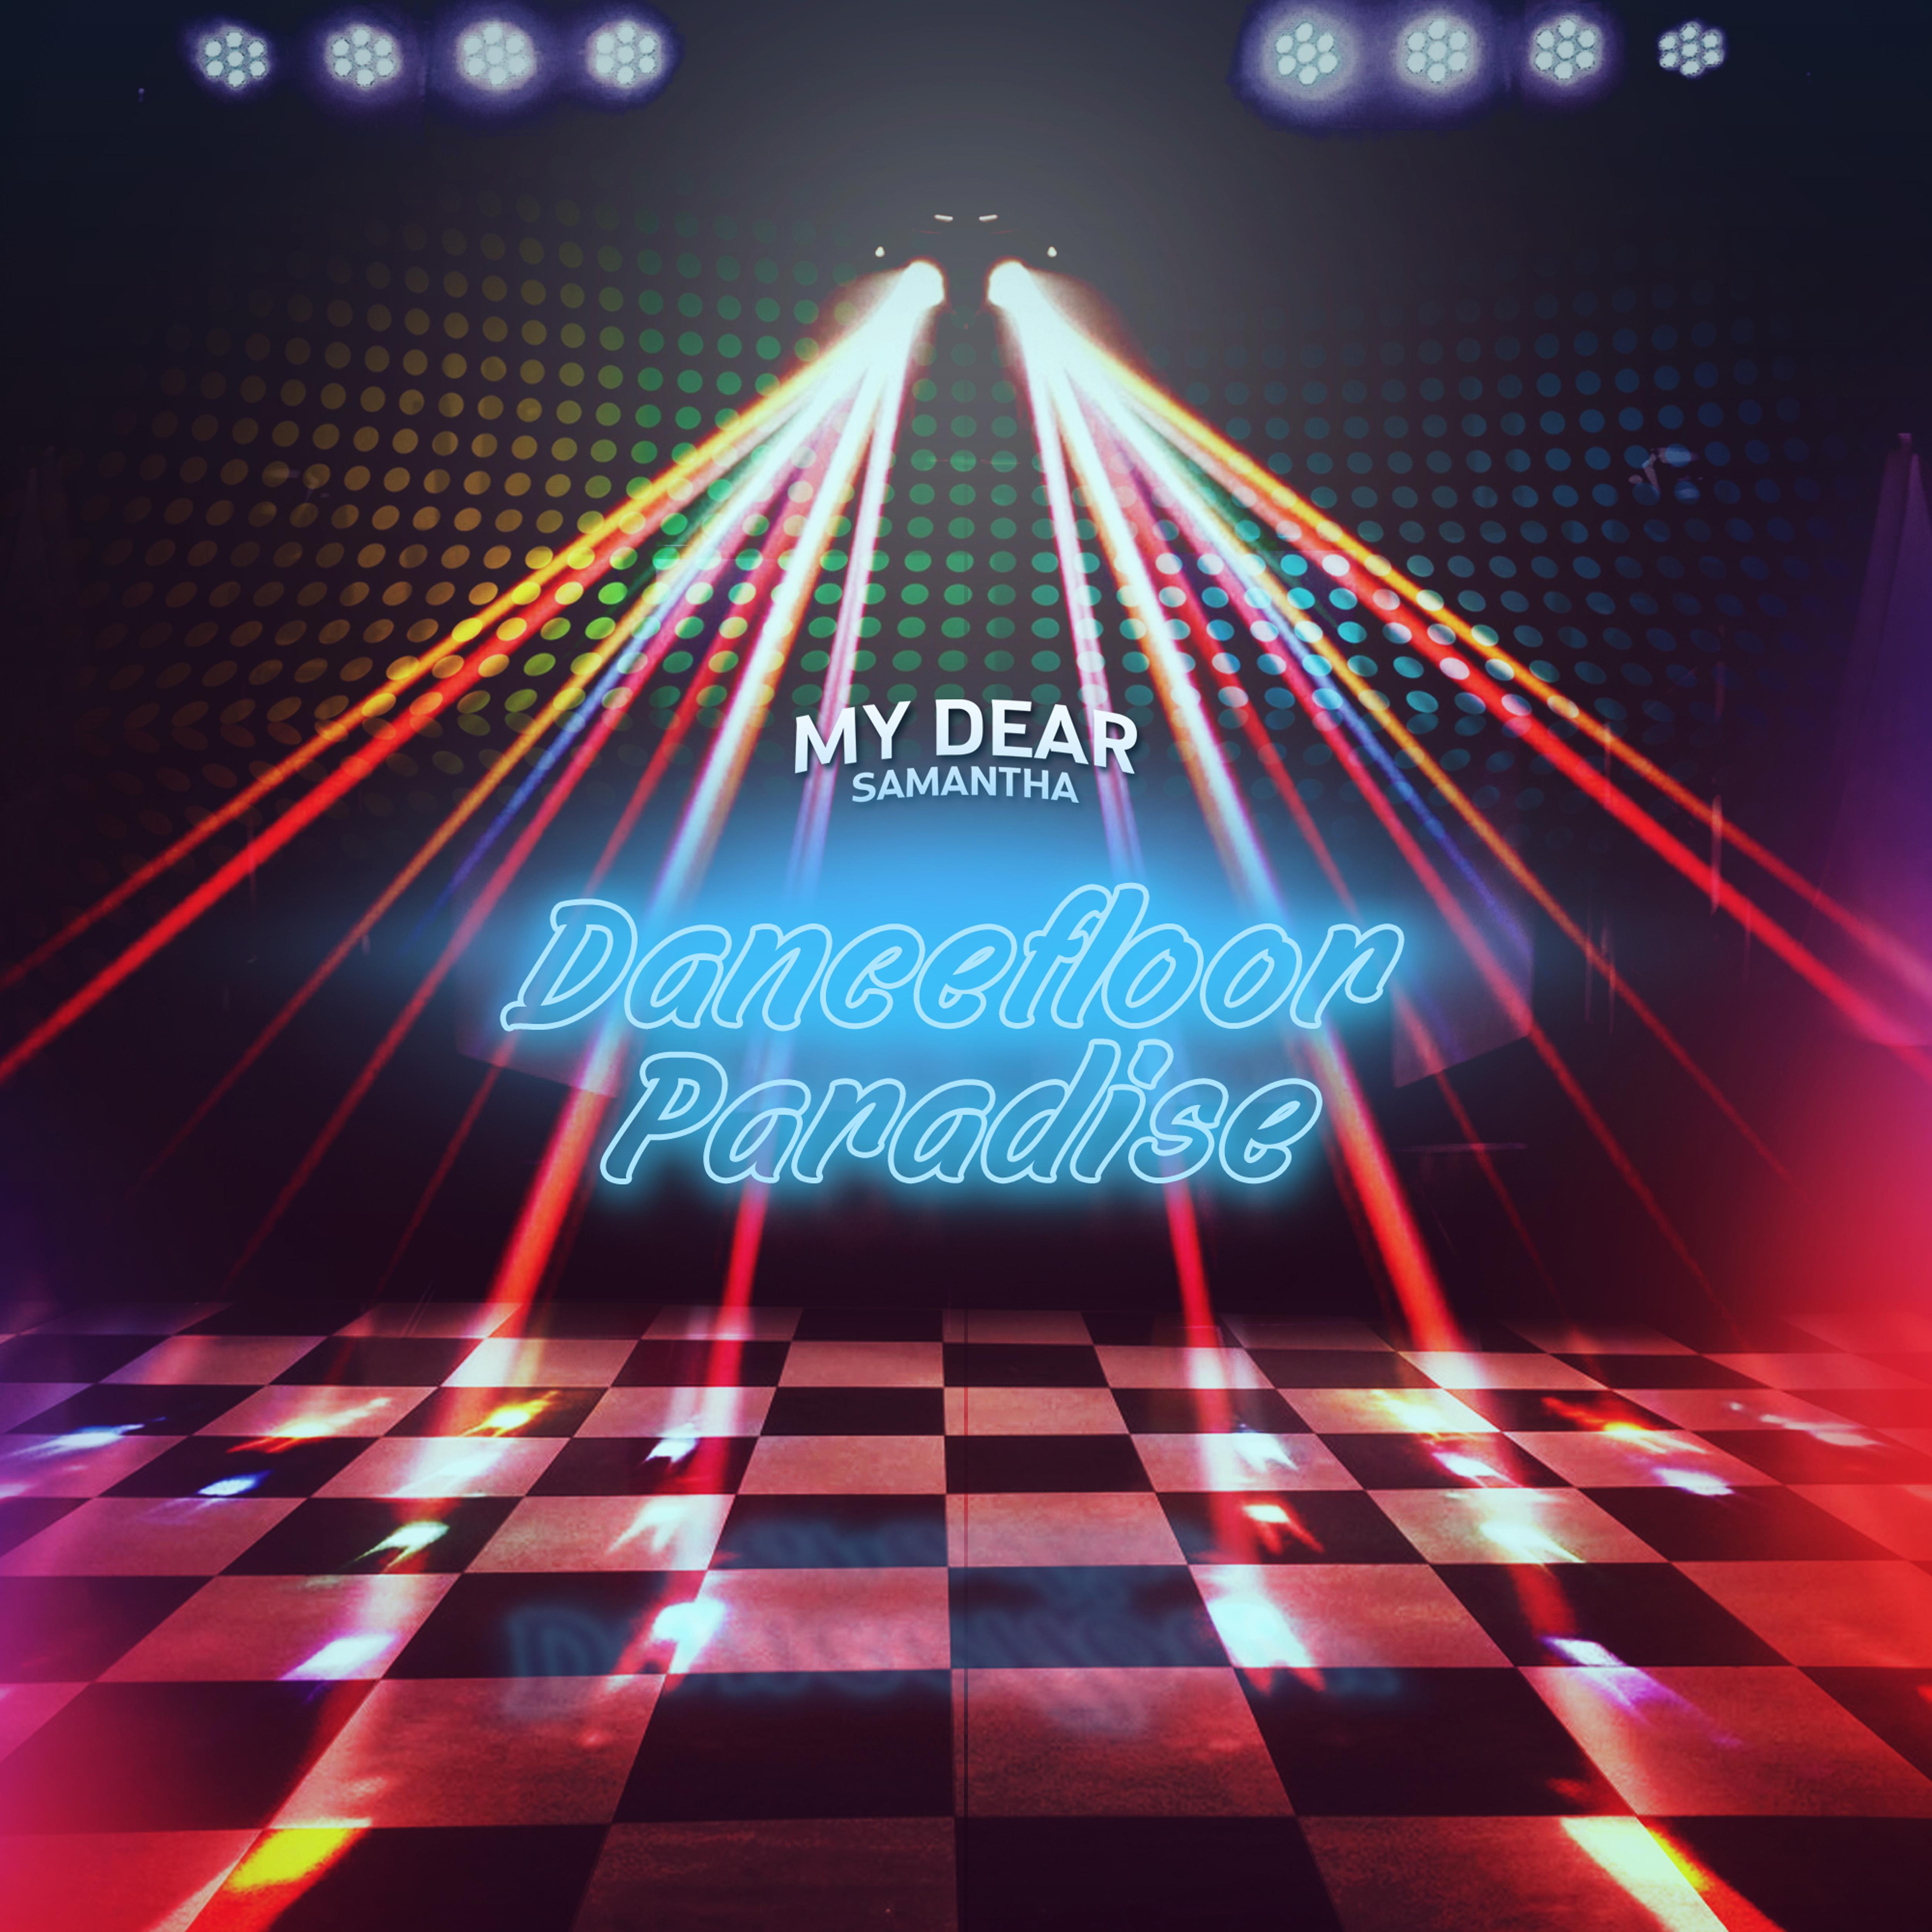 My Dear Samantha – Dancefloor Paradise